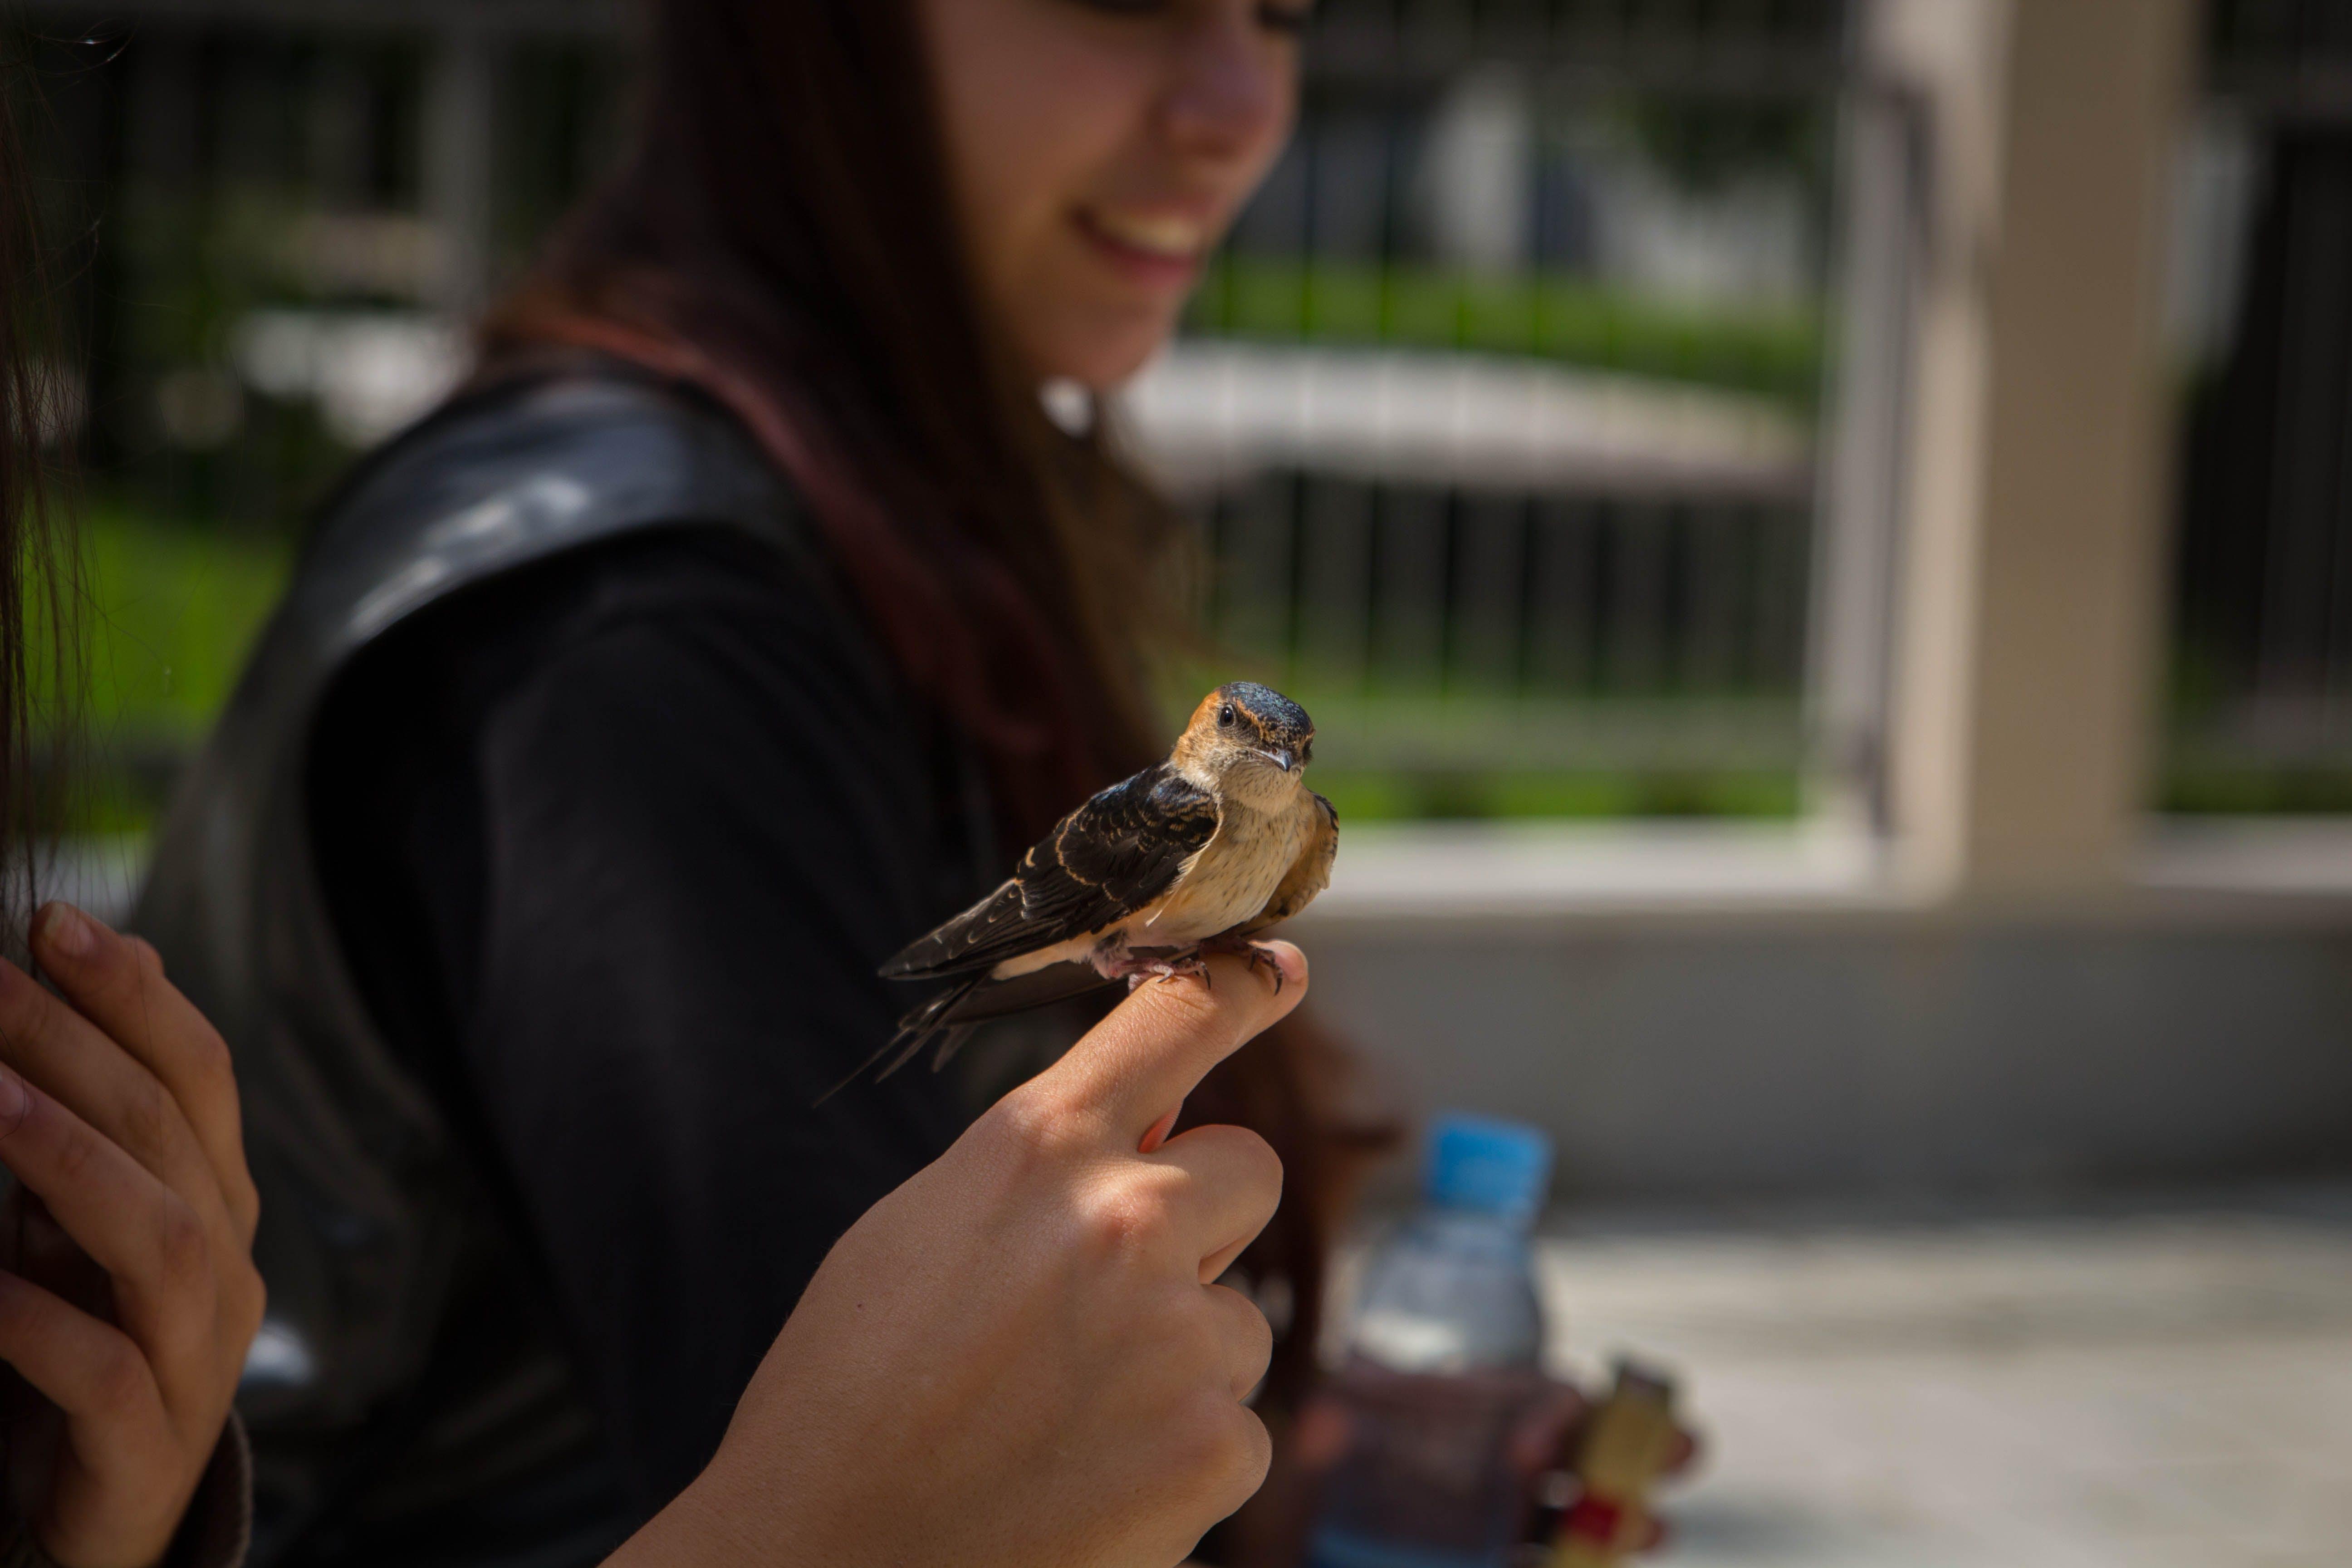 bird, blur, close-up